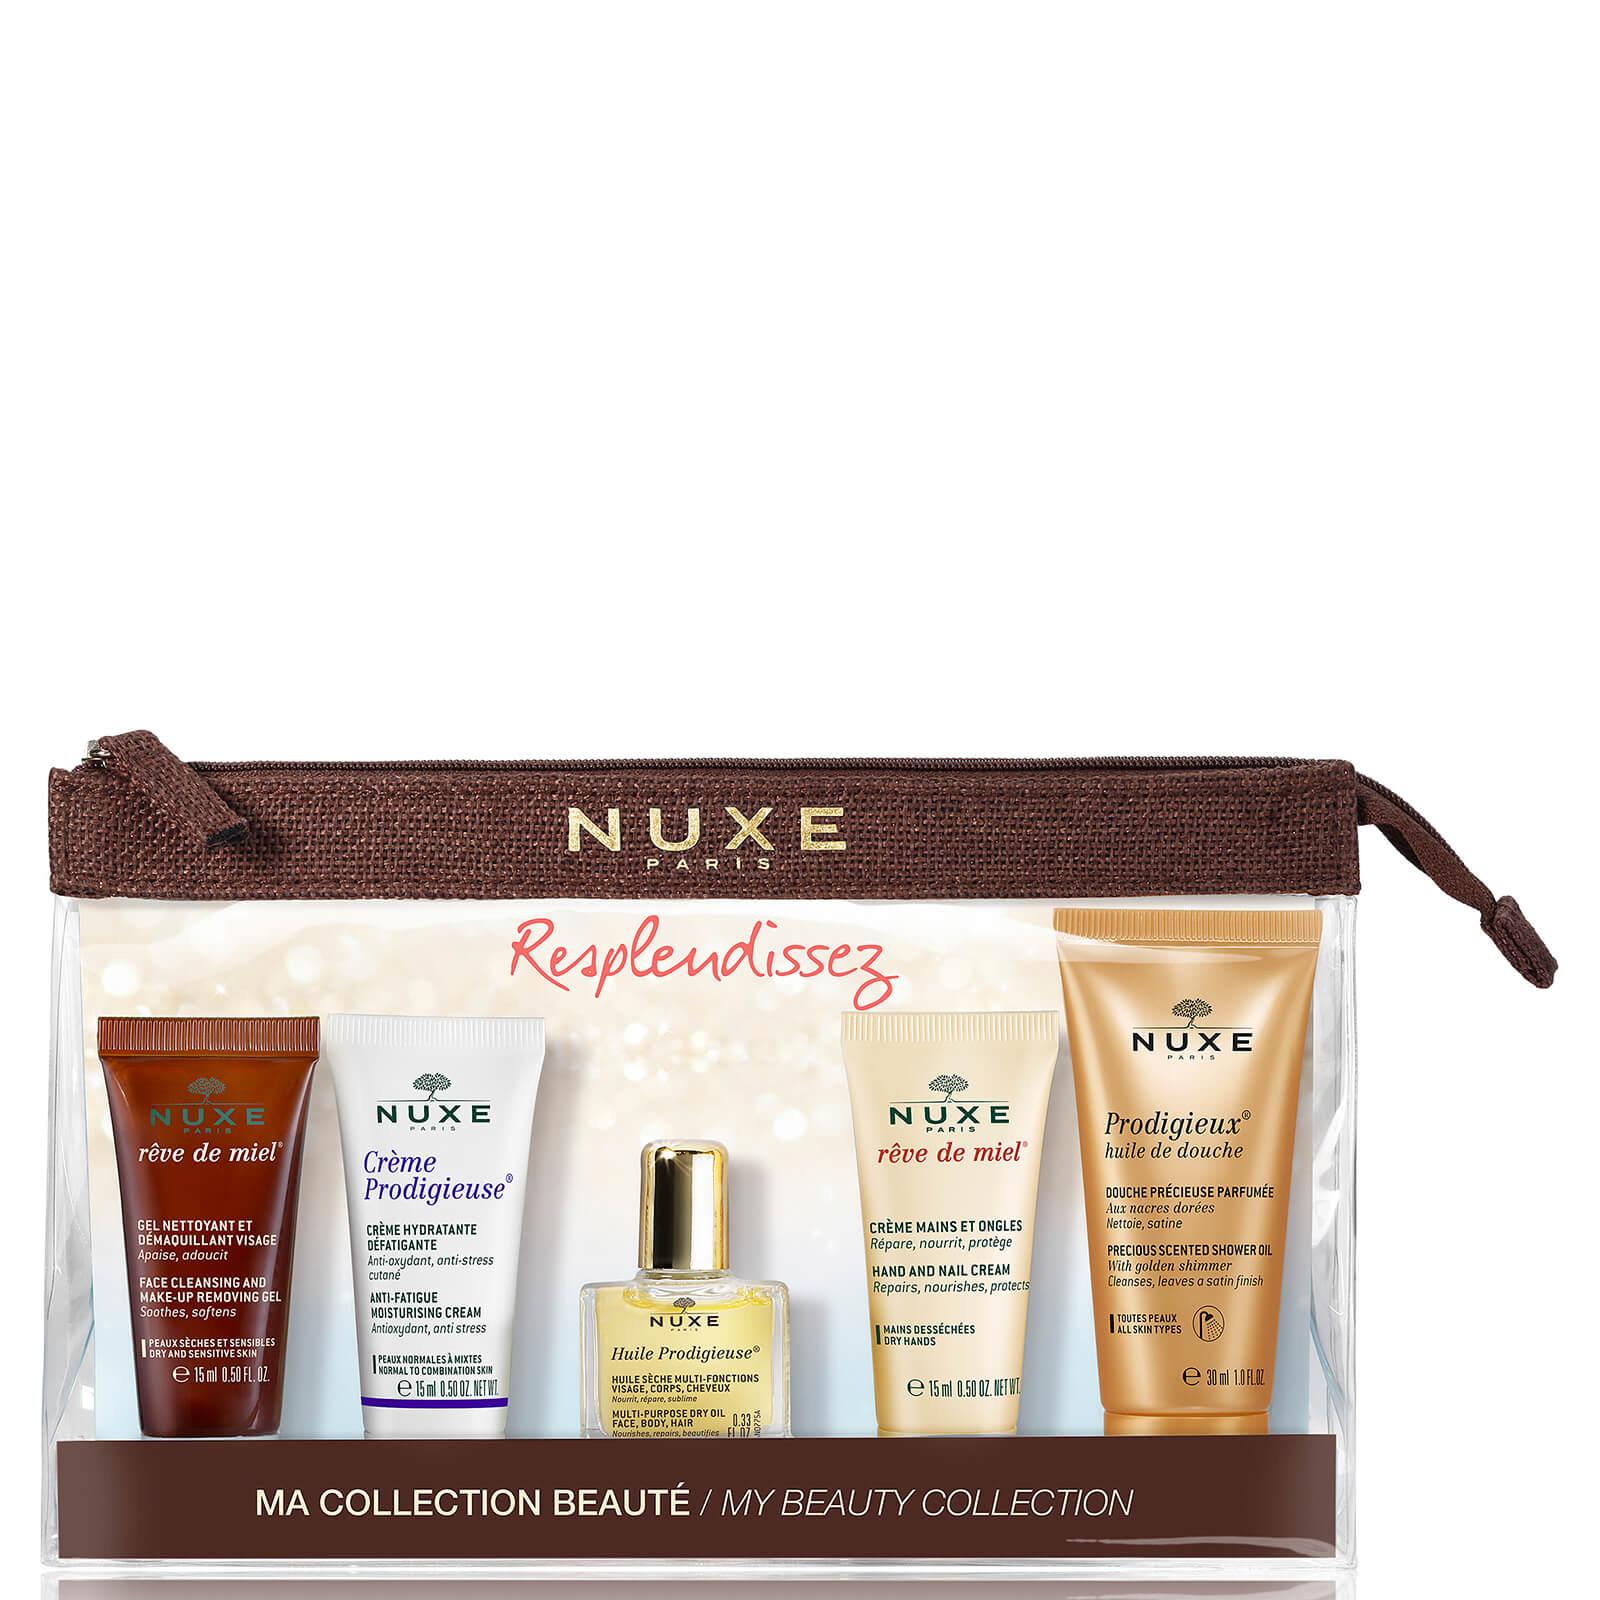 Nuxe Winter Travel Kit Beautyexpert Deryan Toddler Luxe Cream Pueter Sleeping Cot Bed Product Description